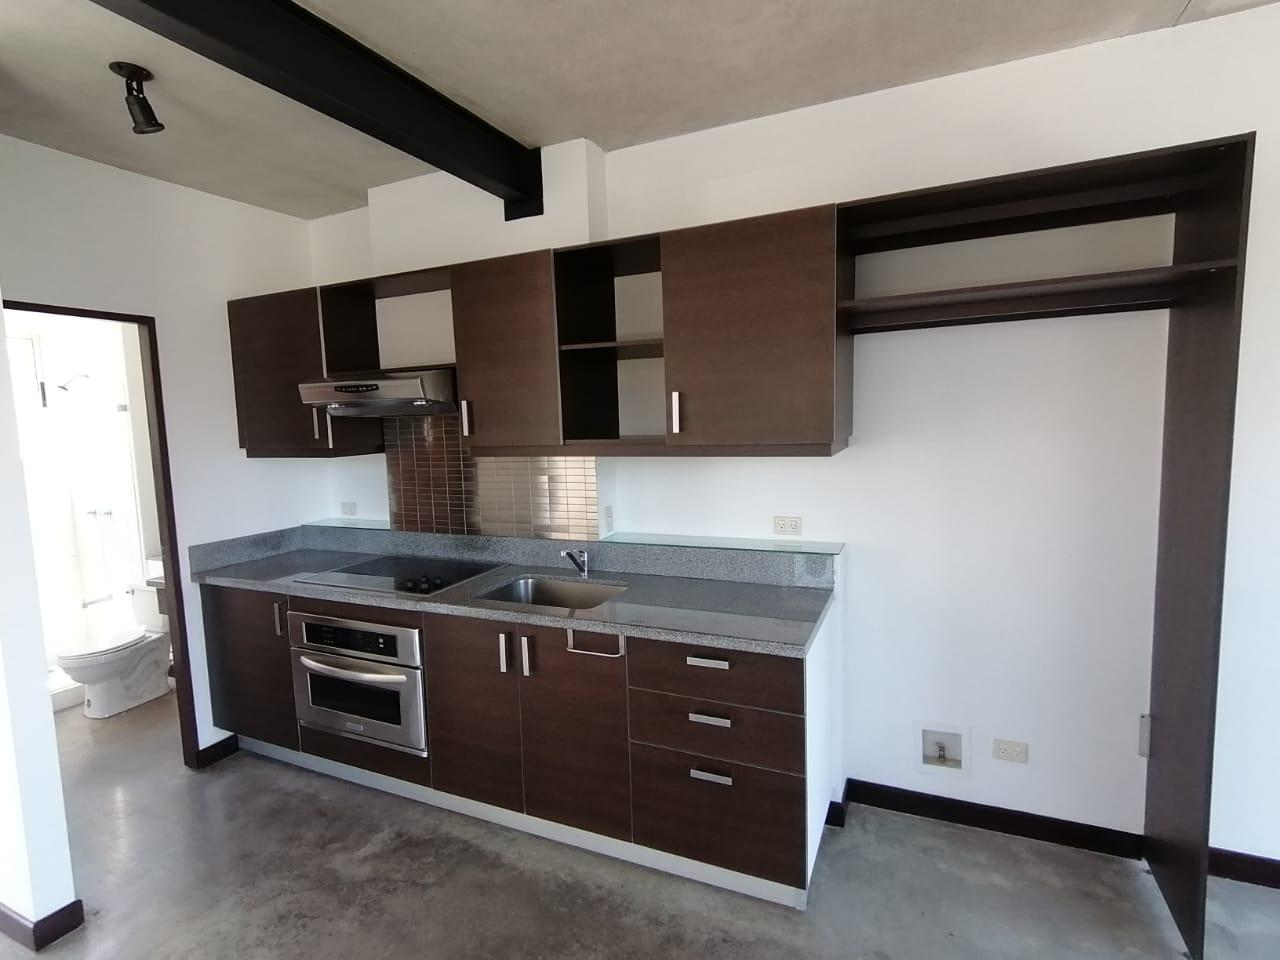 #2207 Loft Apartment For Rent, Santa Ana